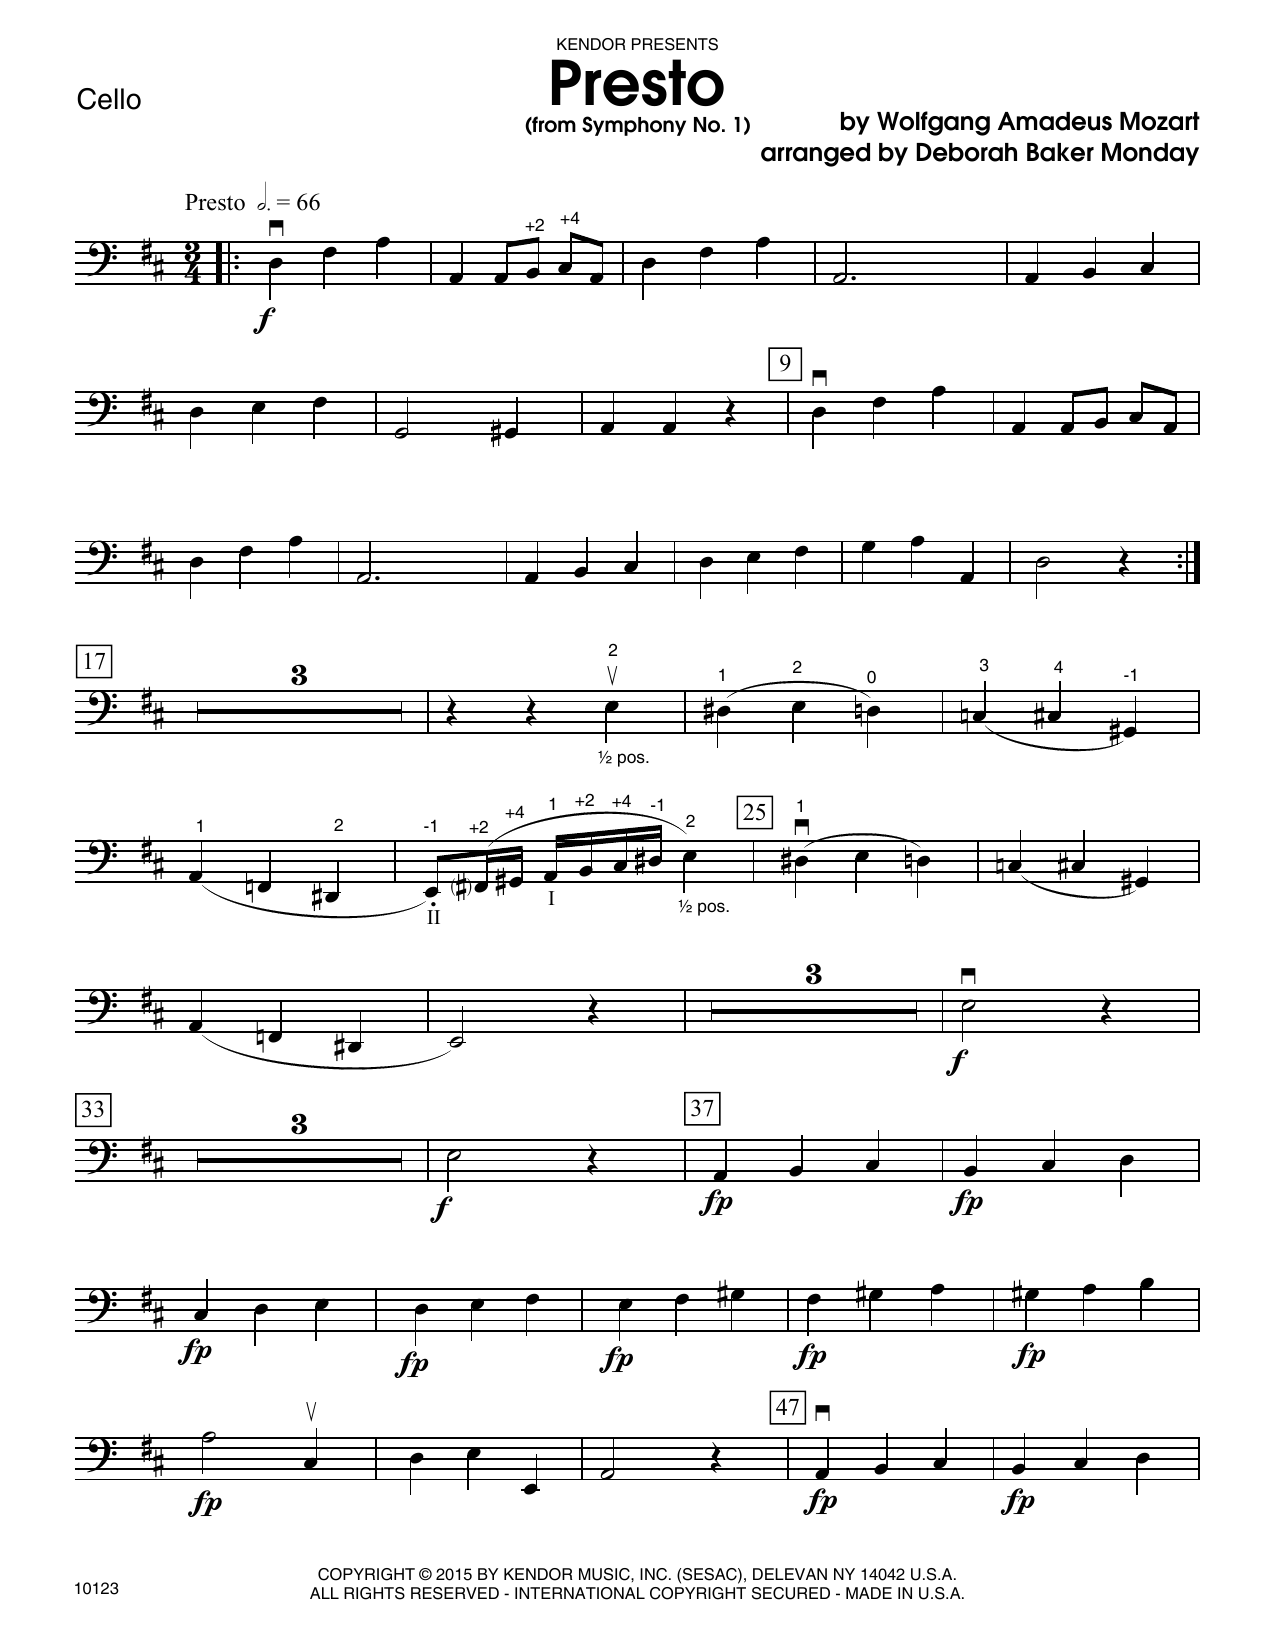 Mozart - Presto (from Symphony No. 1) - Cello